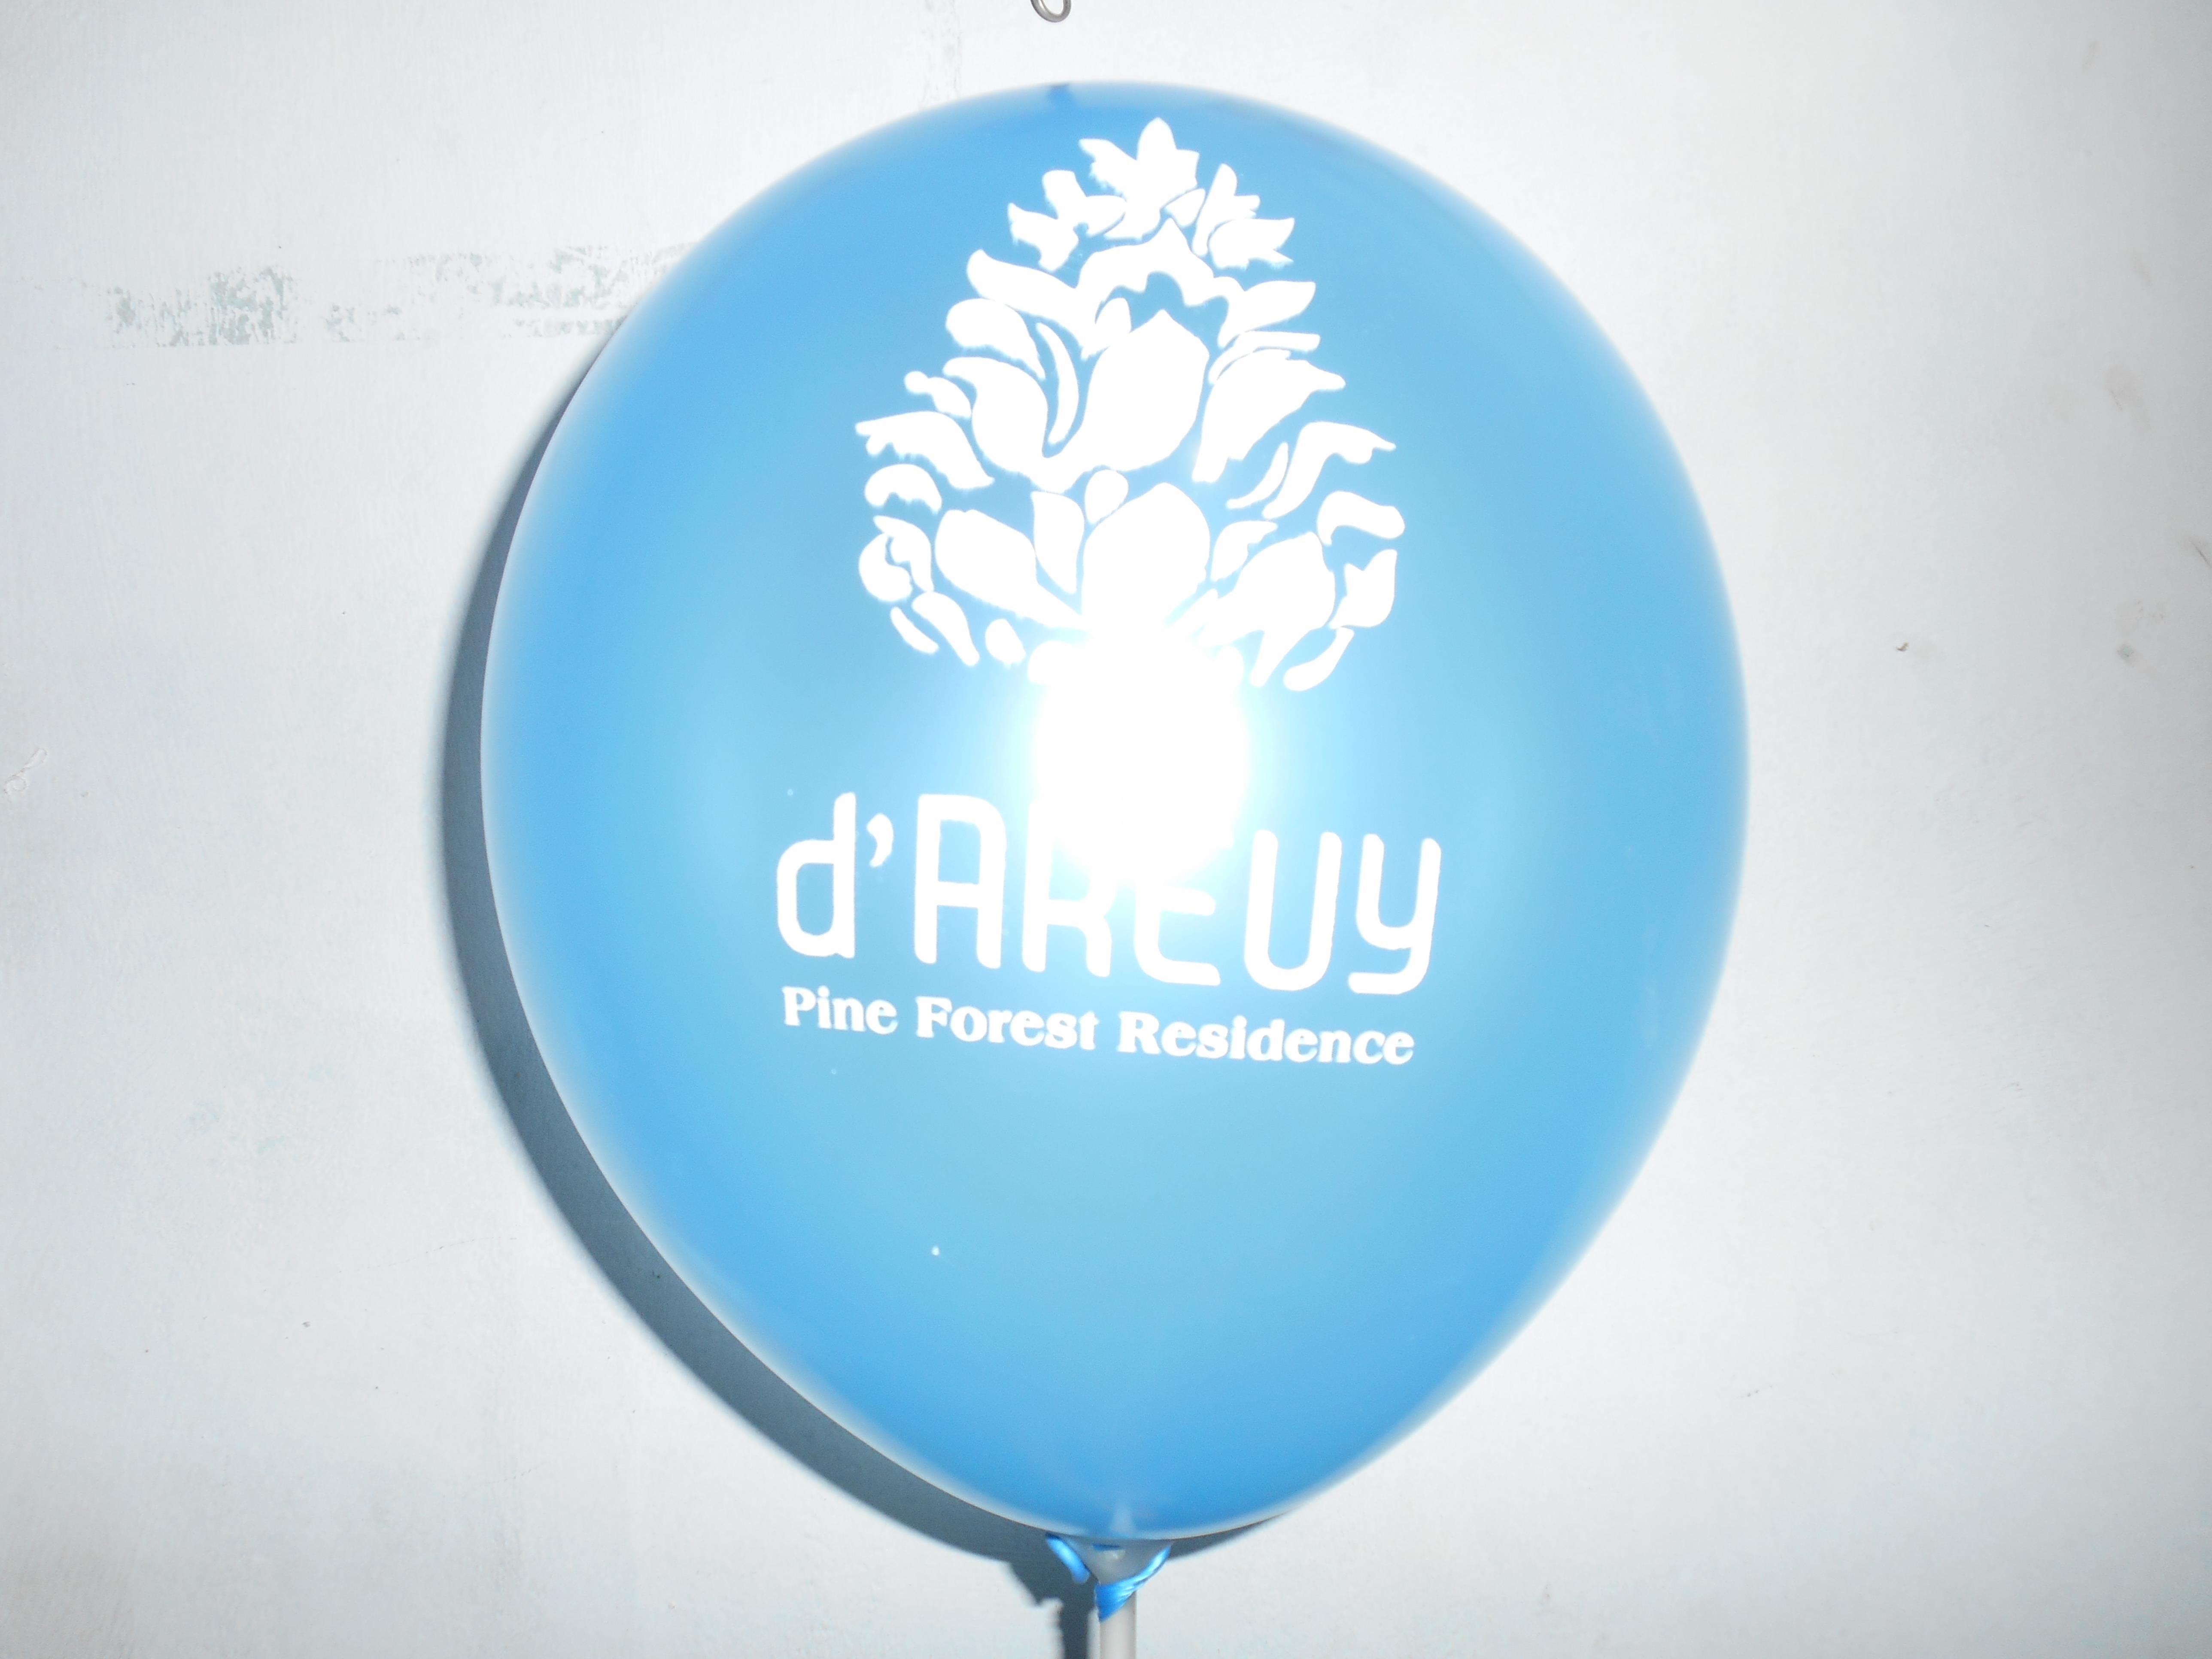 jual dekor harga murah jakarta oleh pt balon international